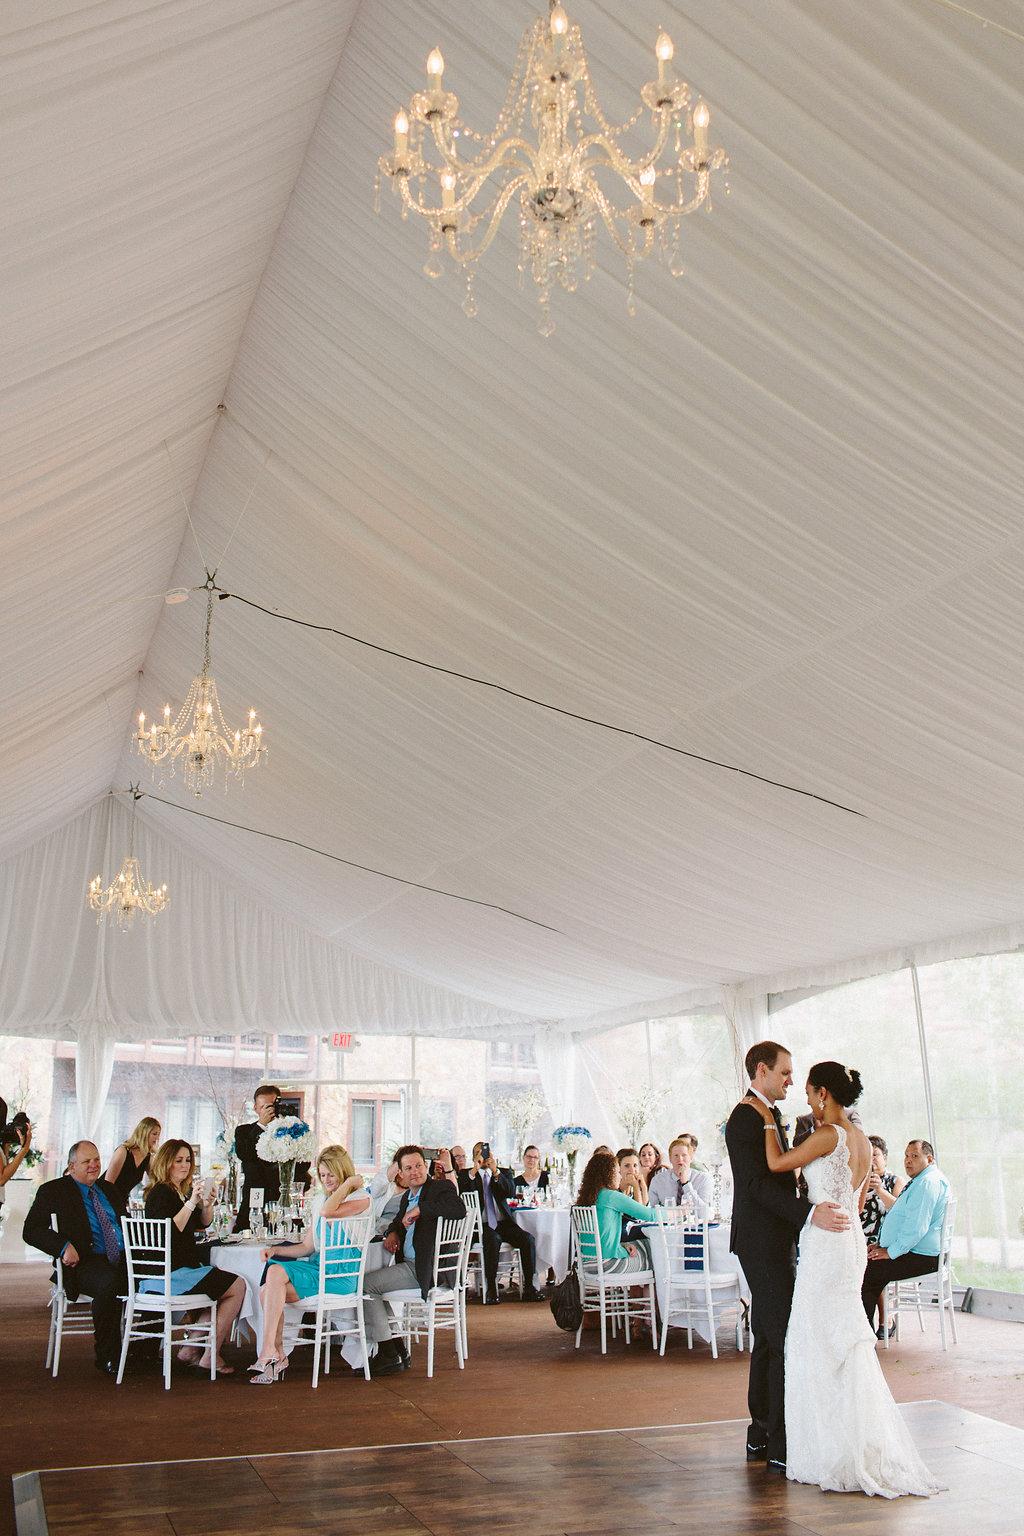 waldorf-astoria-wedding-park-city32.jpg